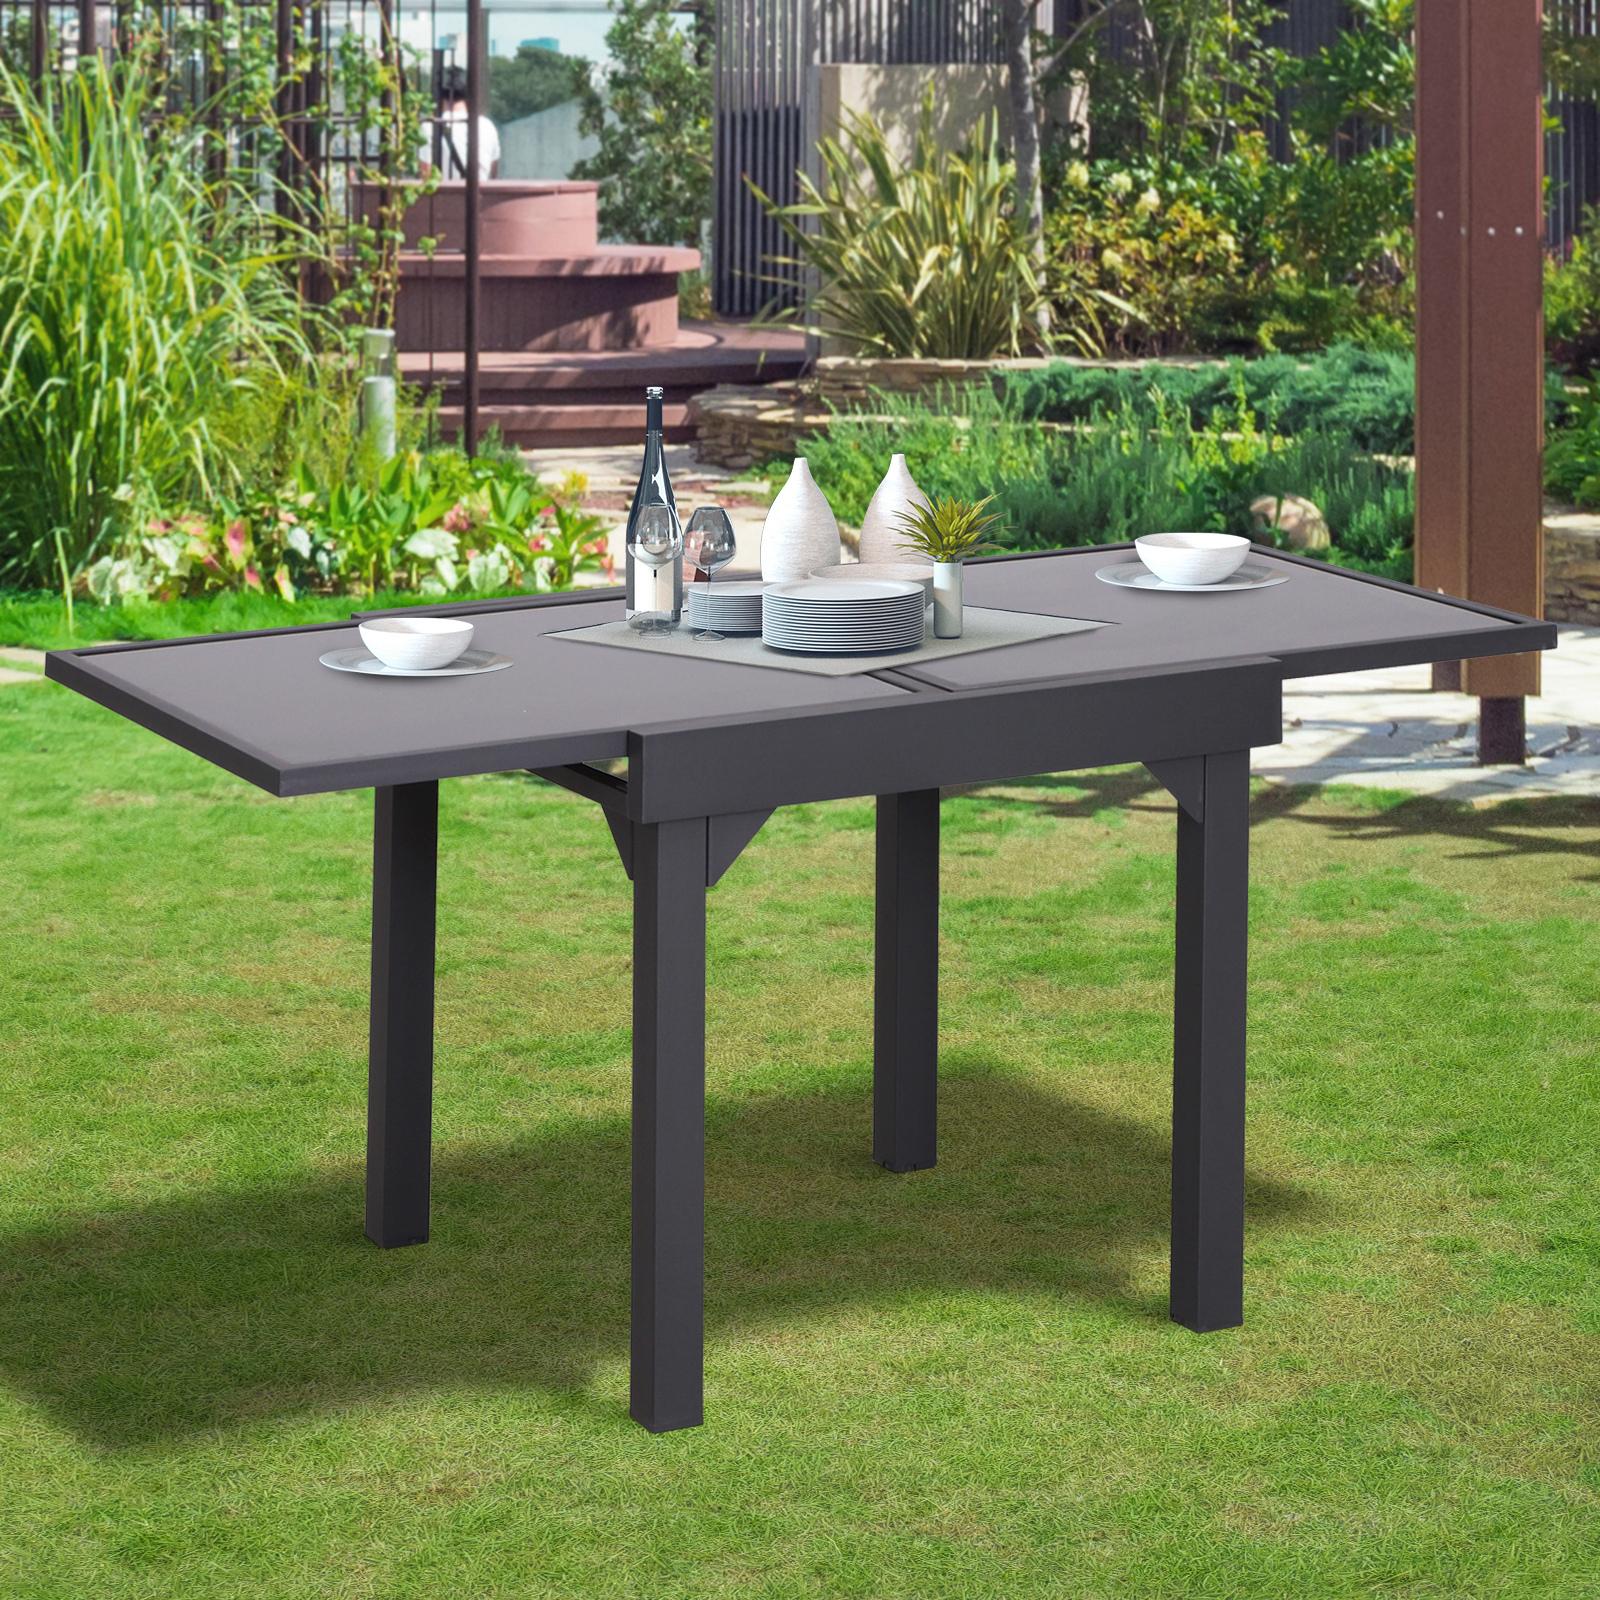 Outsunny Table de Jardin Aluminium Table Extensible avec Plateau en ...